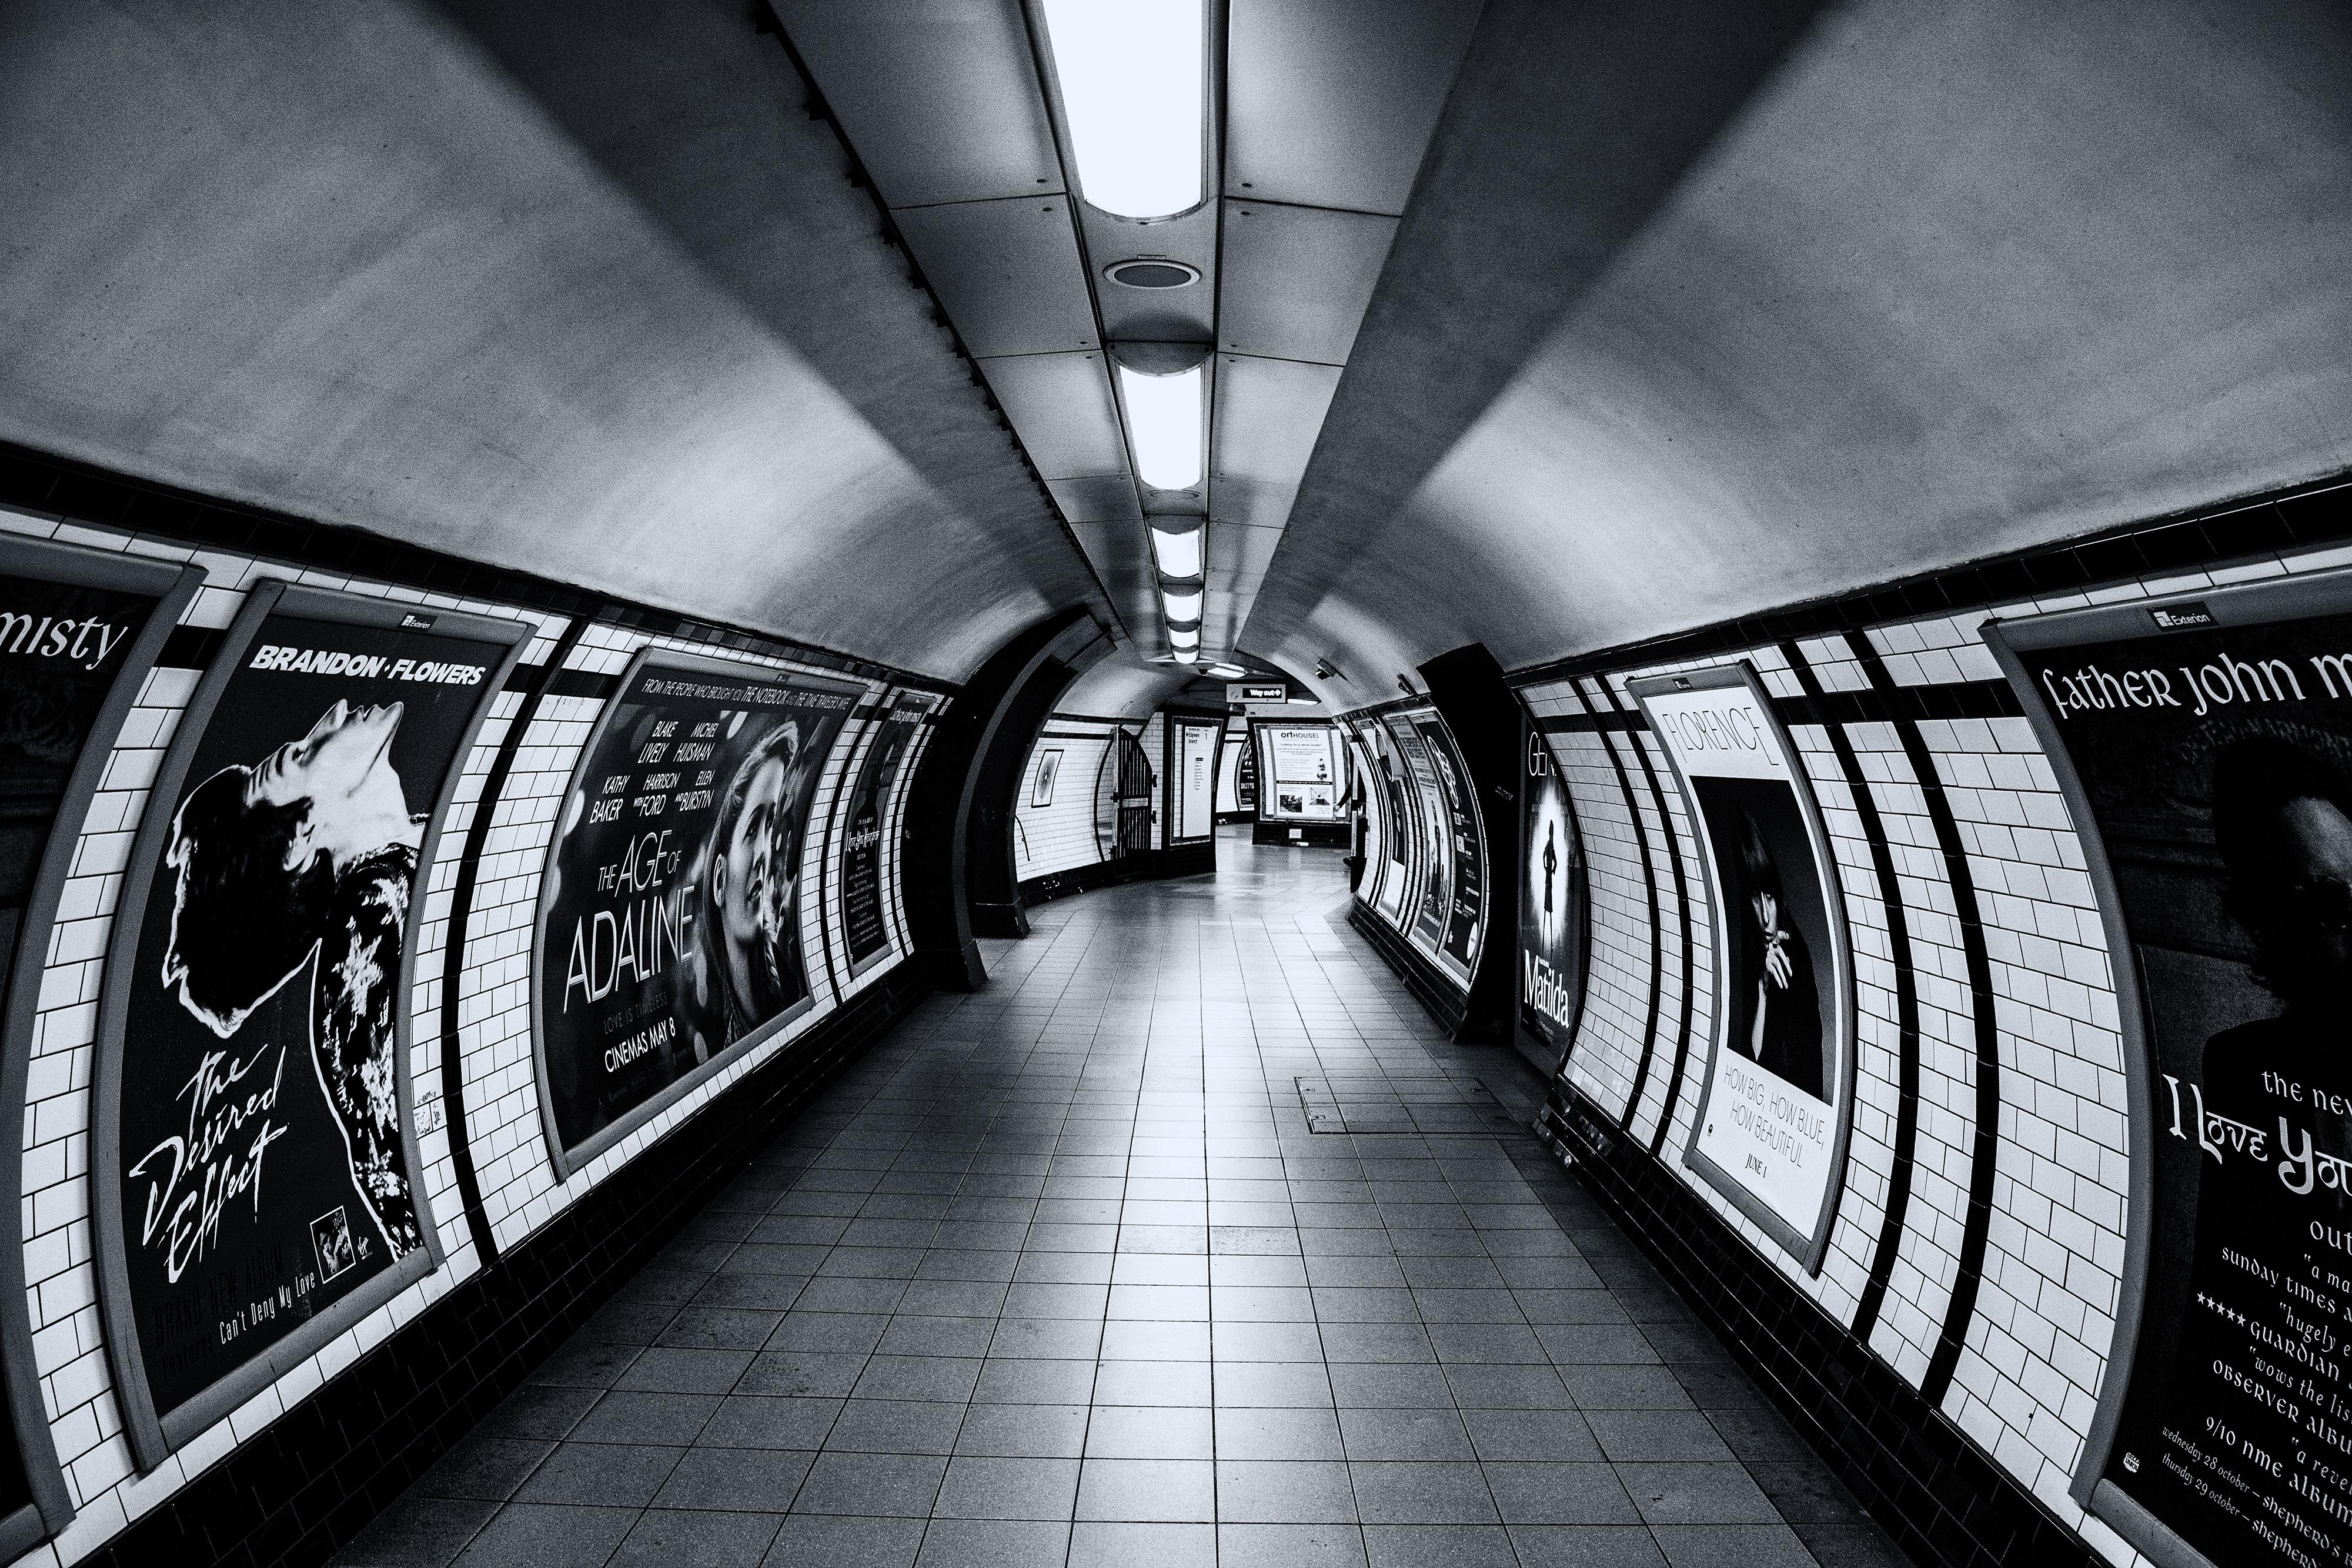 London Underground subway, underground, london, metro, train, train, subway station